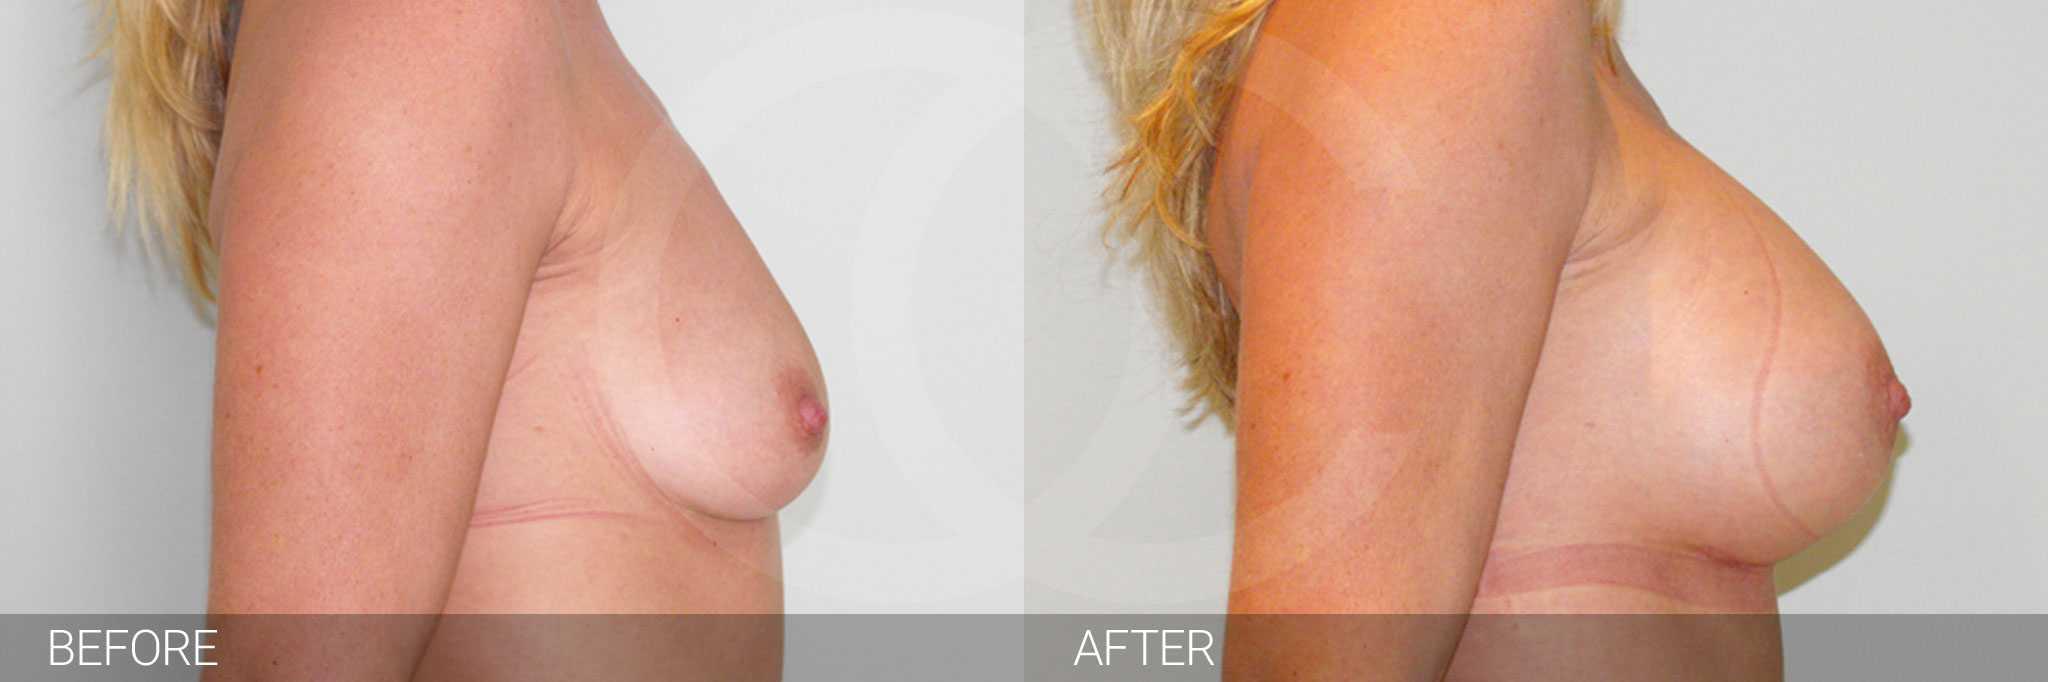 Brustvergrößerung Submuskuläre Implantatposition ante/post-op III